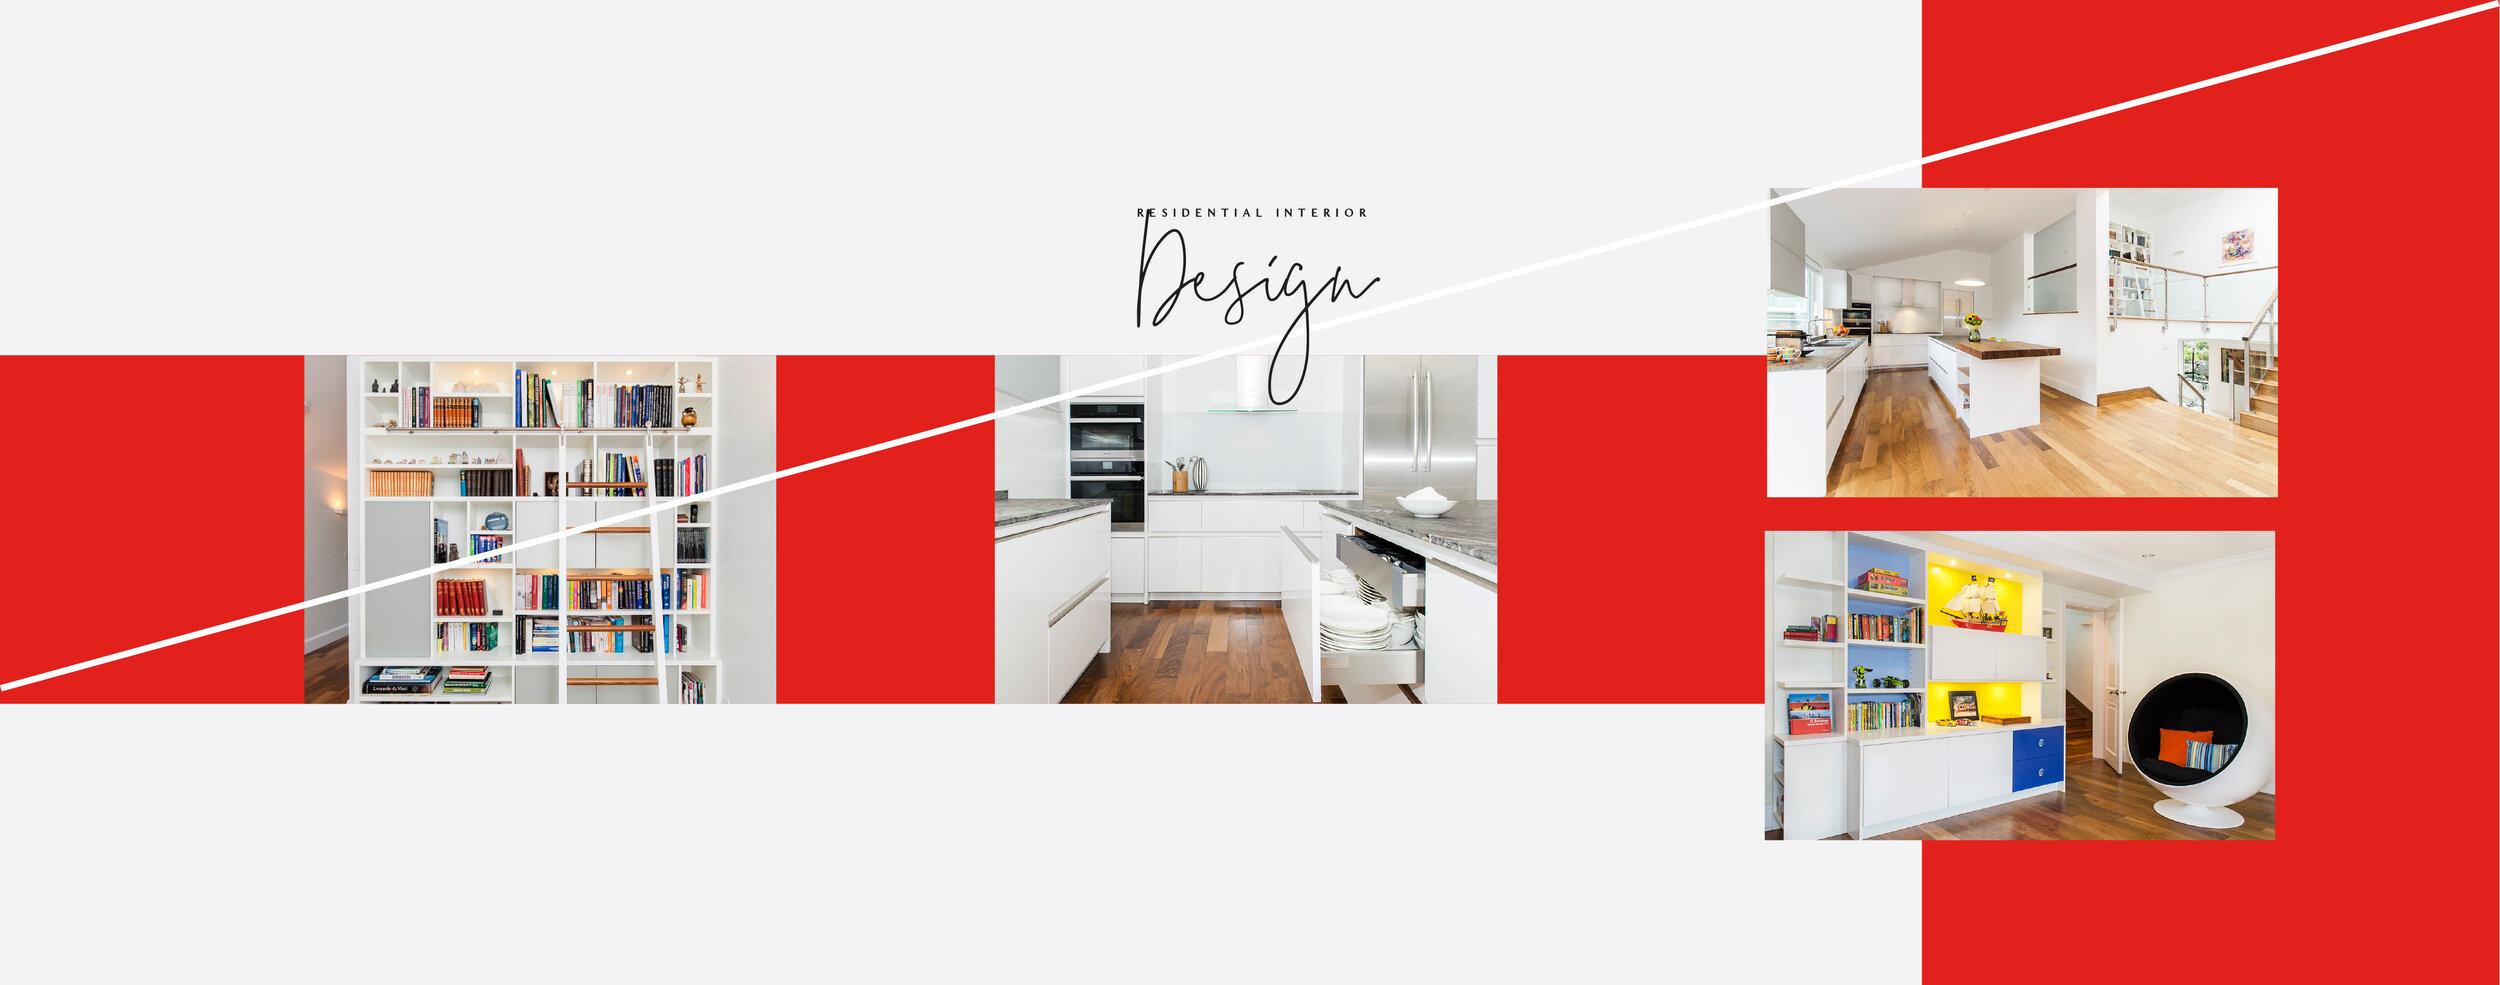 vancouver interior design 1.jpg